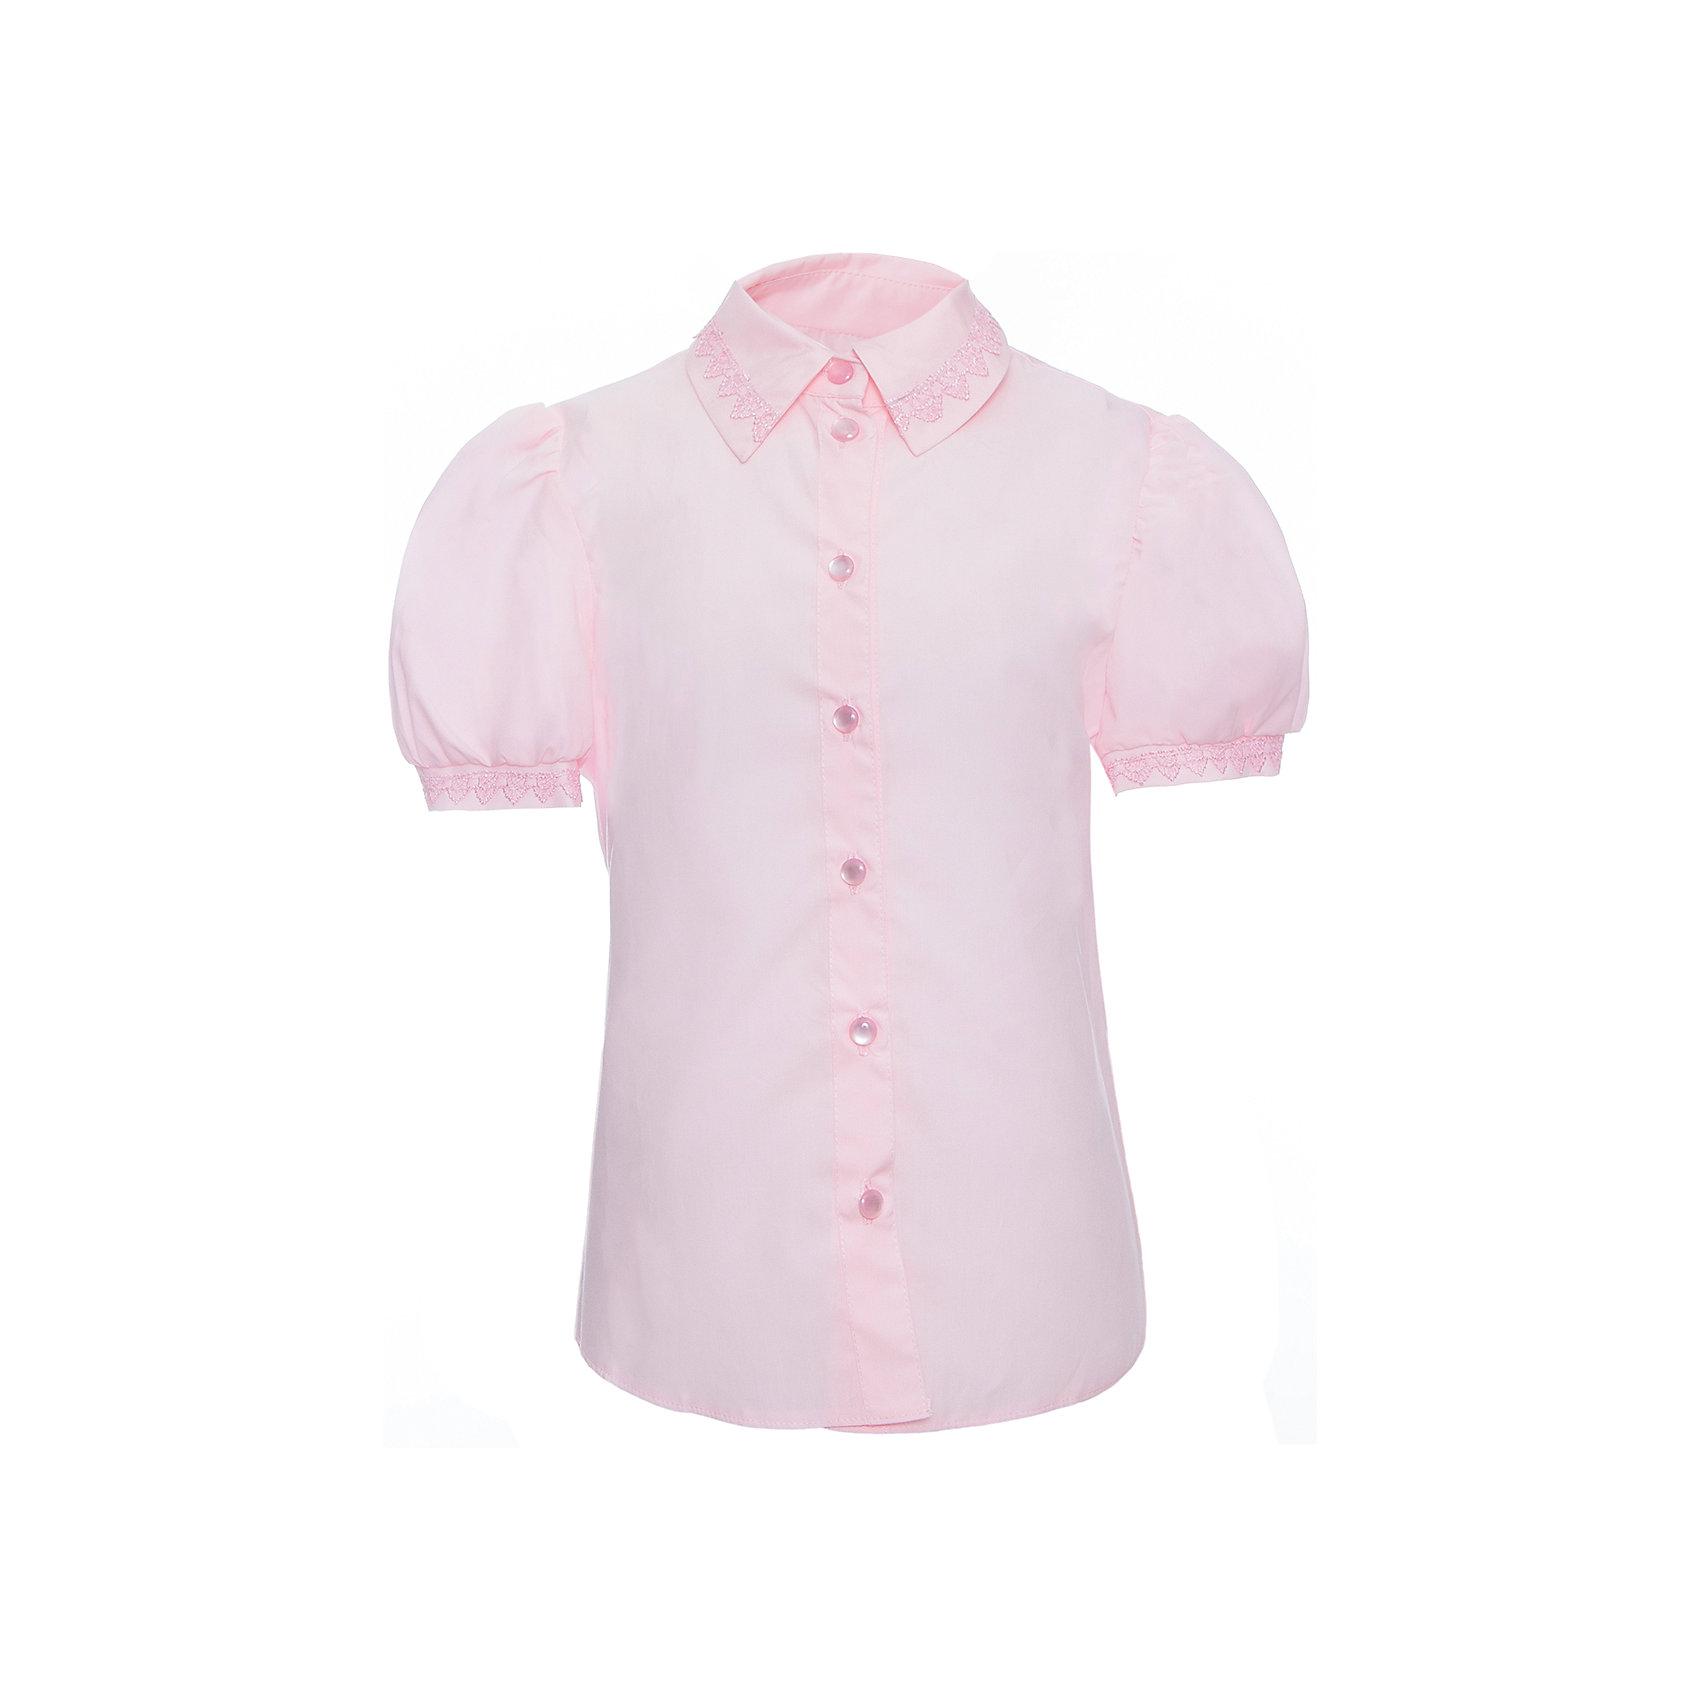 Блузка для девочки СменаБлузки и рубашки<br>Блузка для девочки от известного бренда Смена<br><br>Состав:<br>35%-хлопок;65%-полиэстер<br><br>Ширина мм: 186<br>Глубина мм: 87<br>Высота мм: 198<br>Вес г: 197<br>Цвет: розовый<br>Возраст от месяцев: 132<br>Возраст до месяцев: 144<br>Пол: Женский<br>Возраст: Детский<br>Размер: 152,140,134,158,146,128,122<br>SKU: 4720325